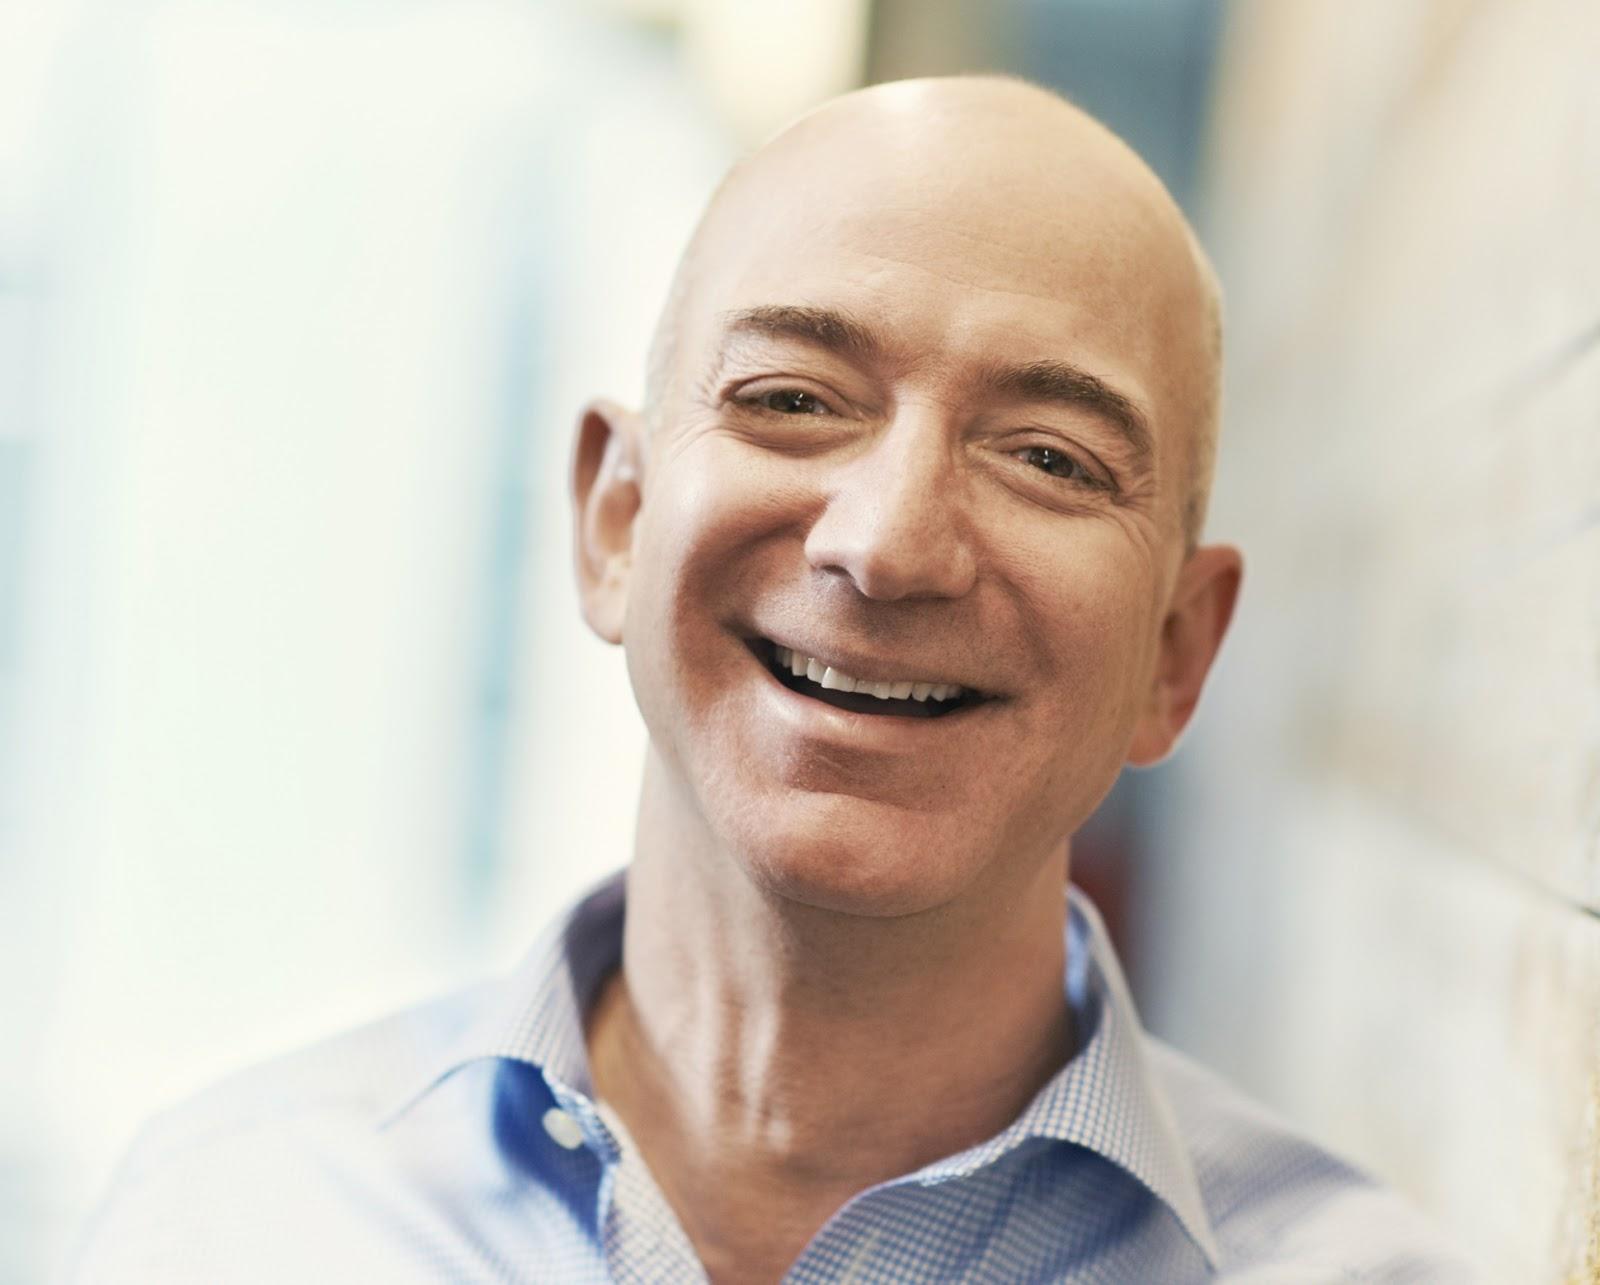 Unglamorous First Jobs Of Billionaires Like Jeff Bezos And Elon Musk